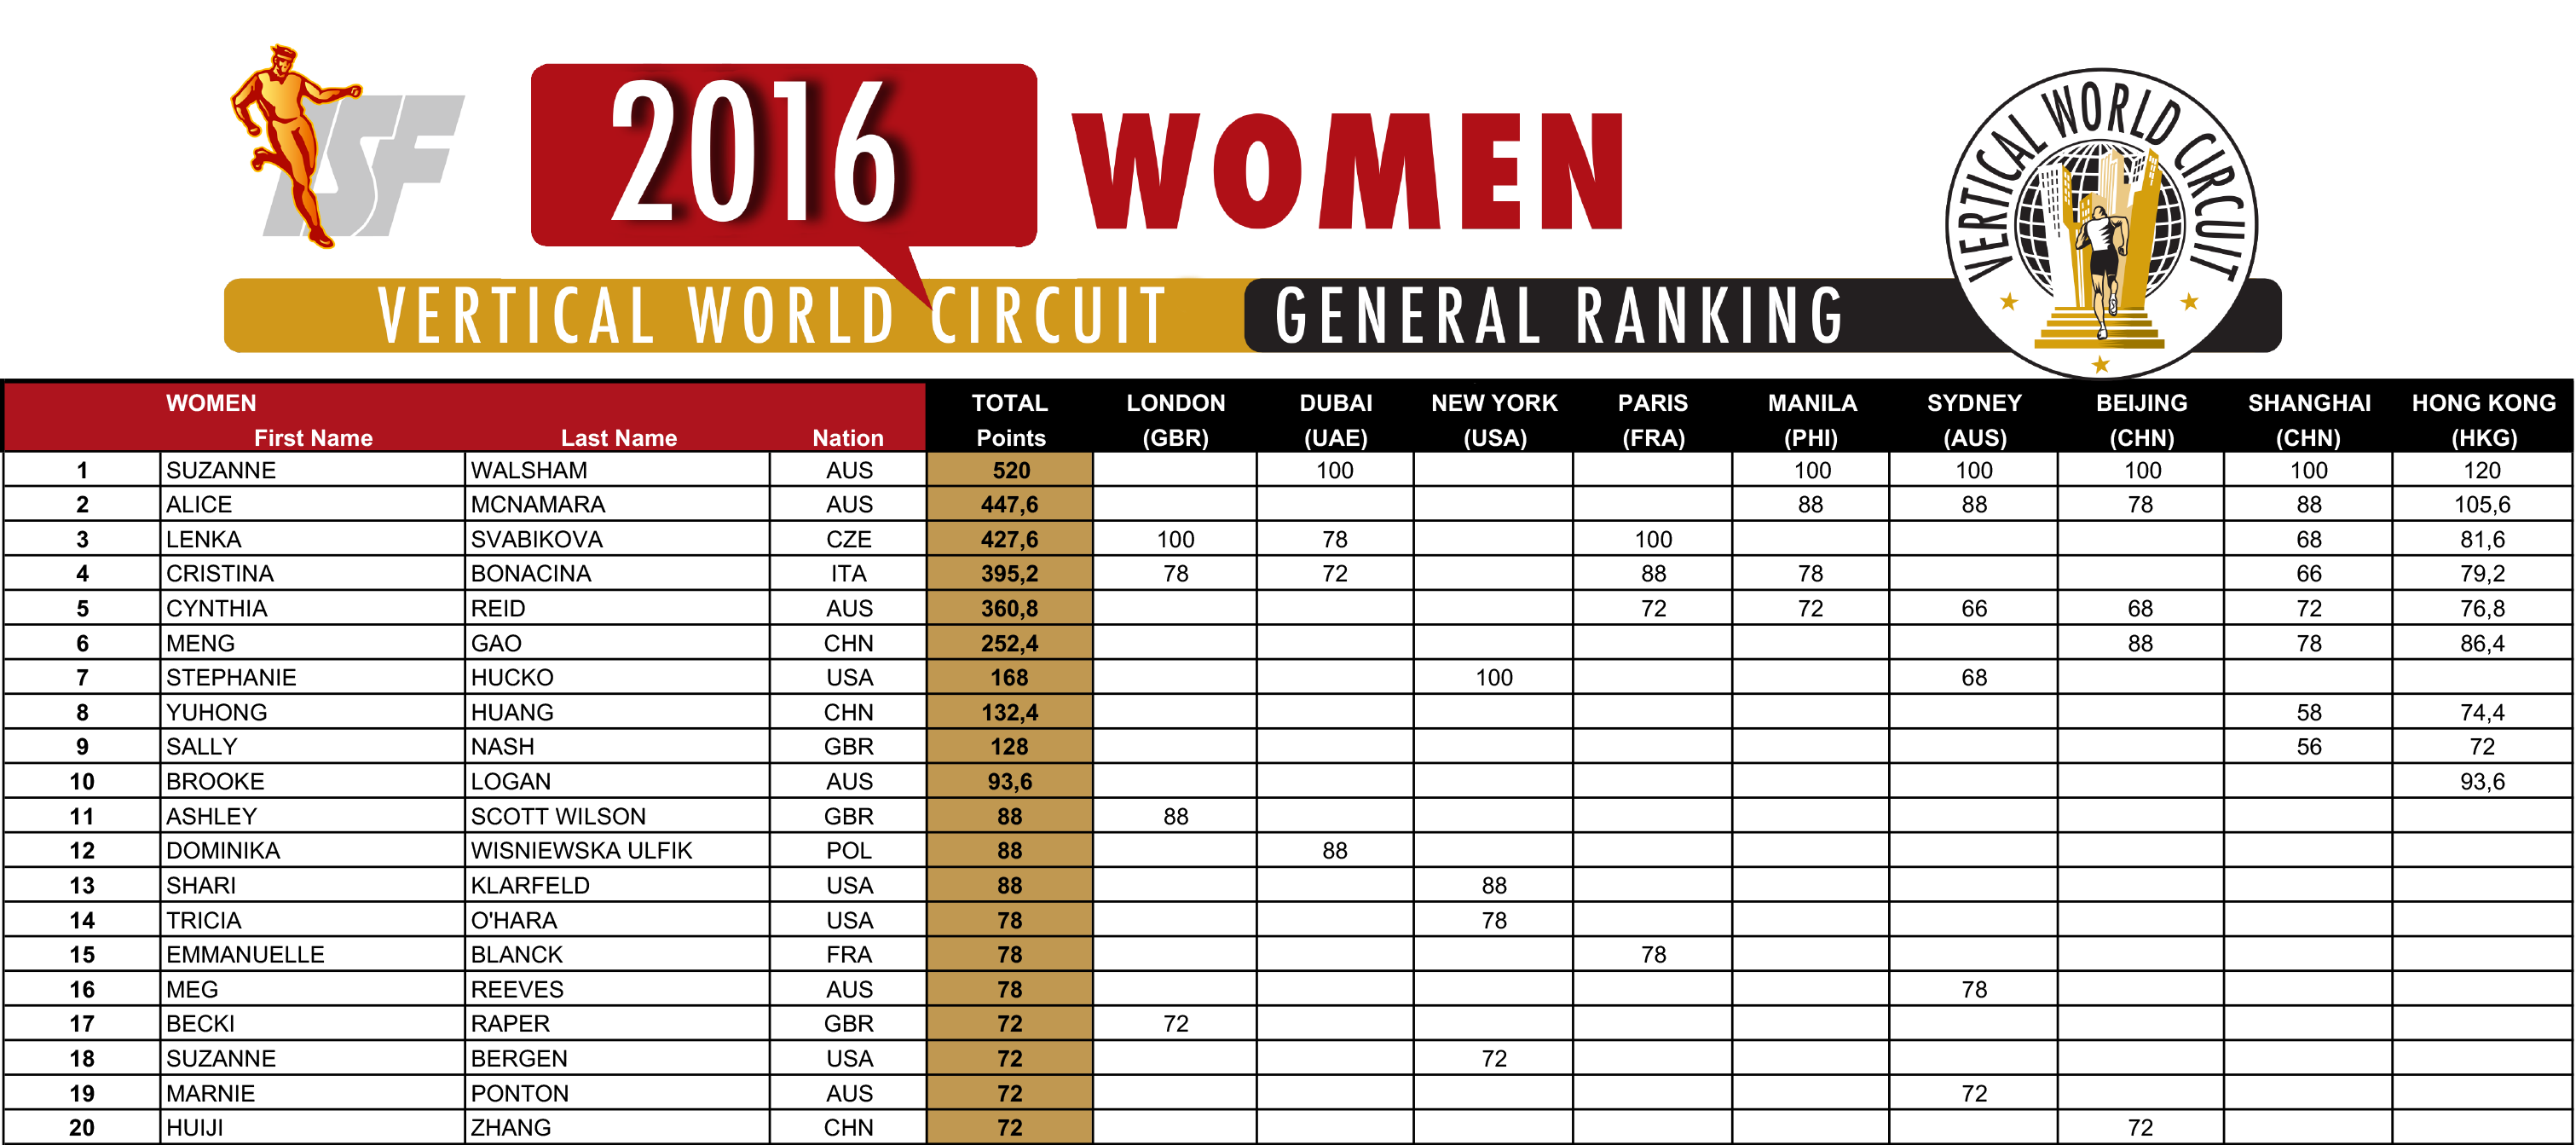 2016-vwc-ranking_women-04-12